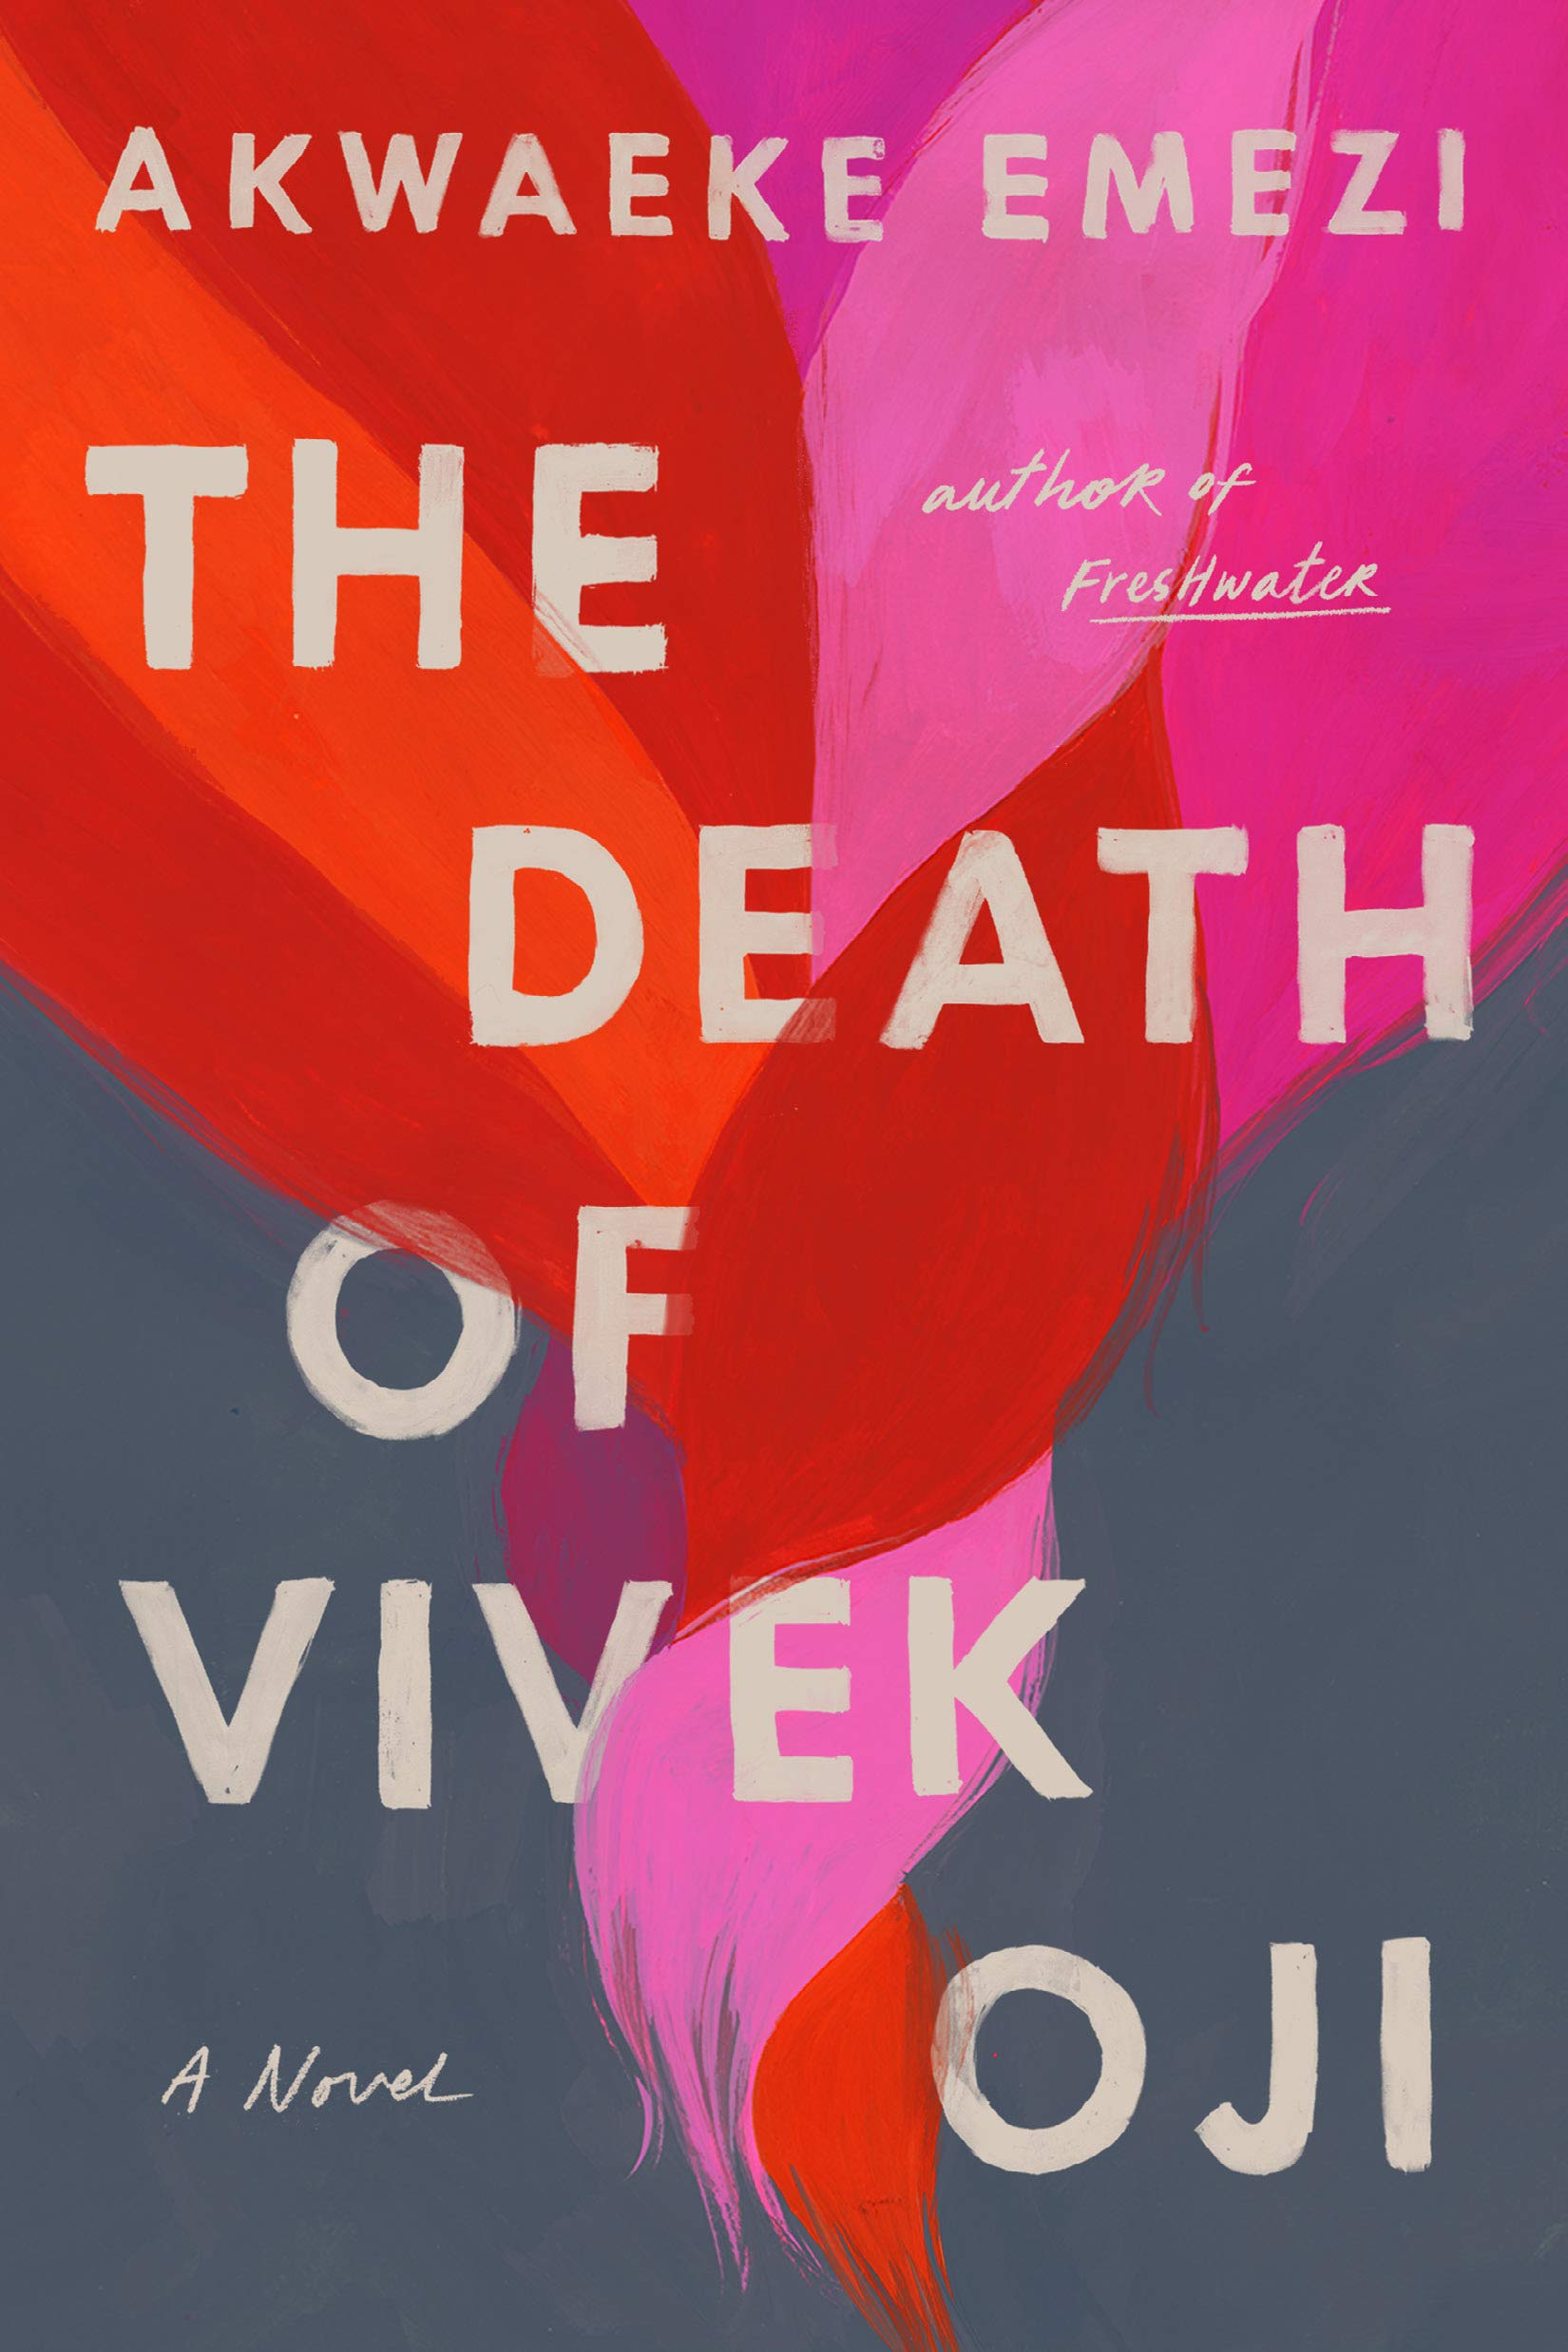 The Death of Vivek Oji cover